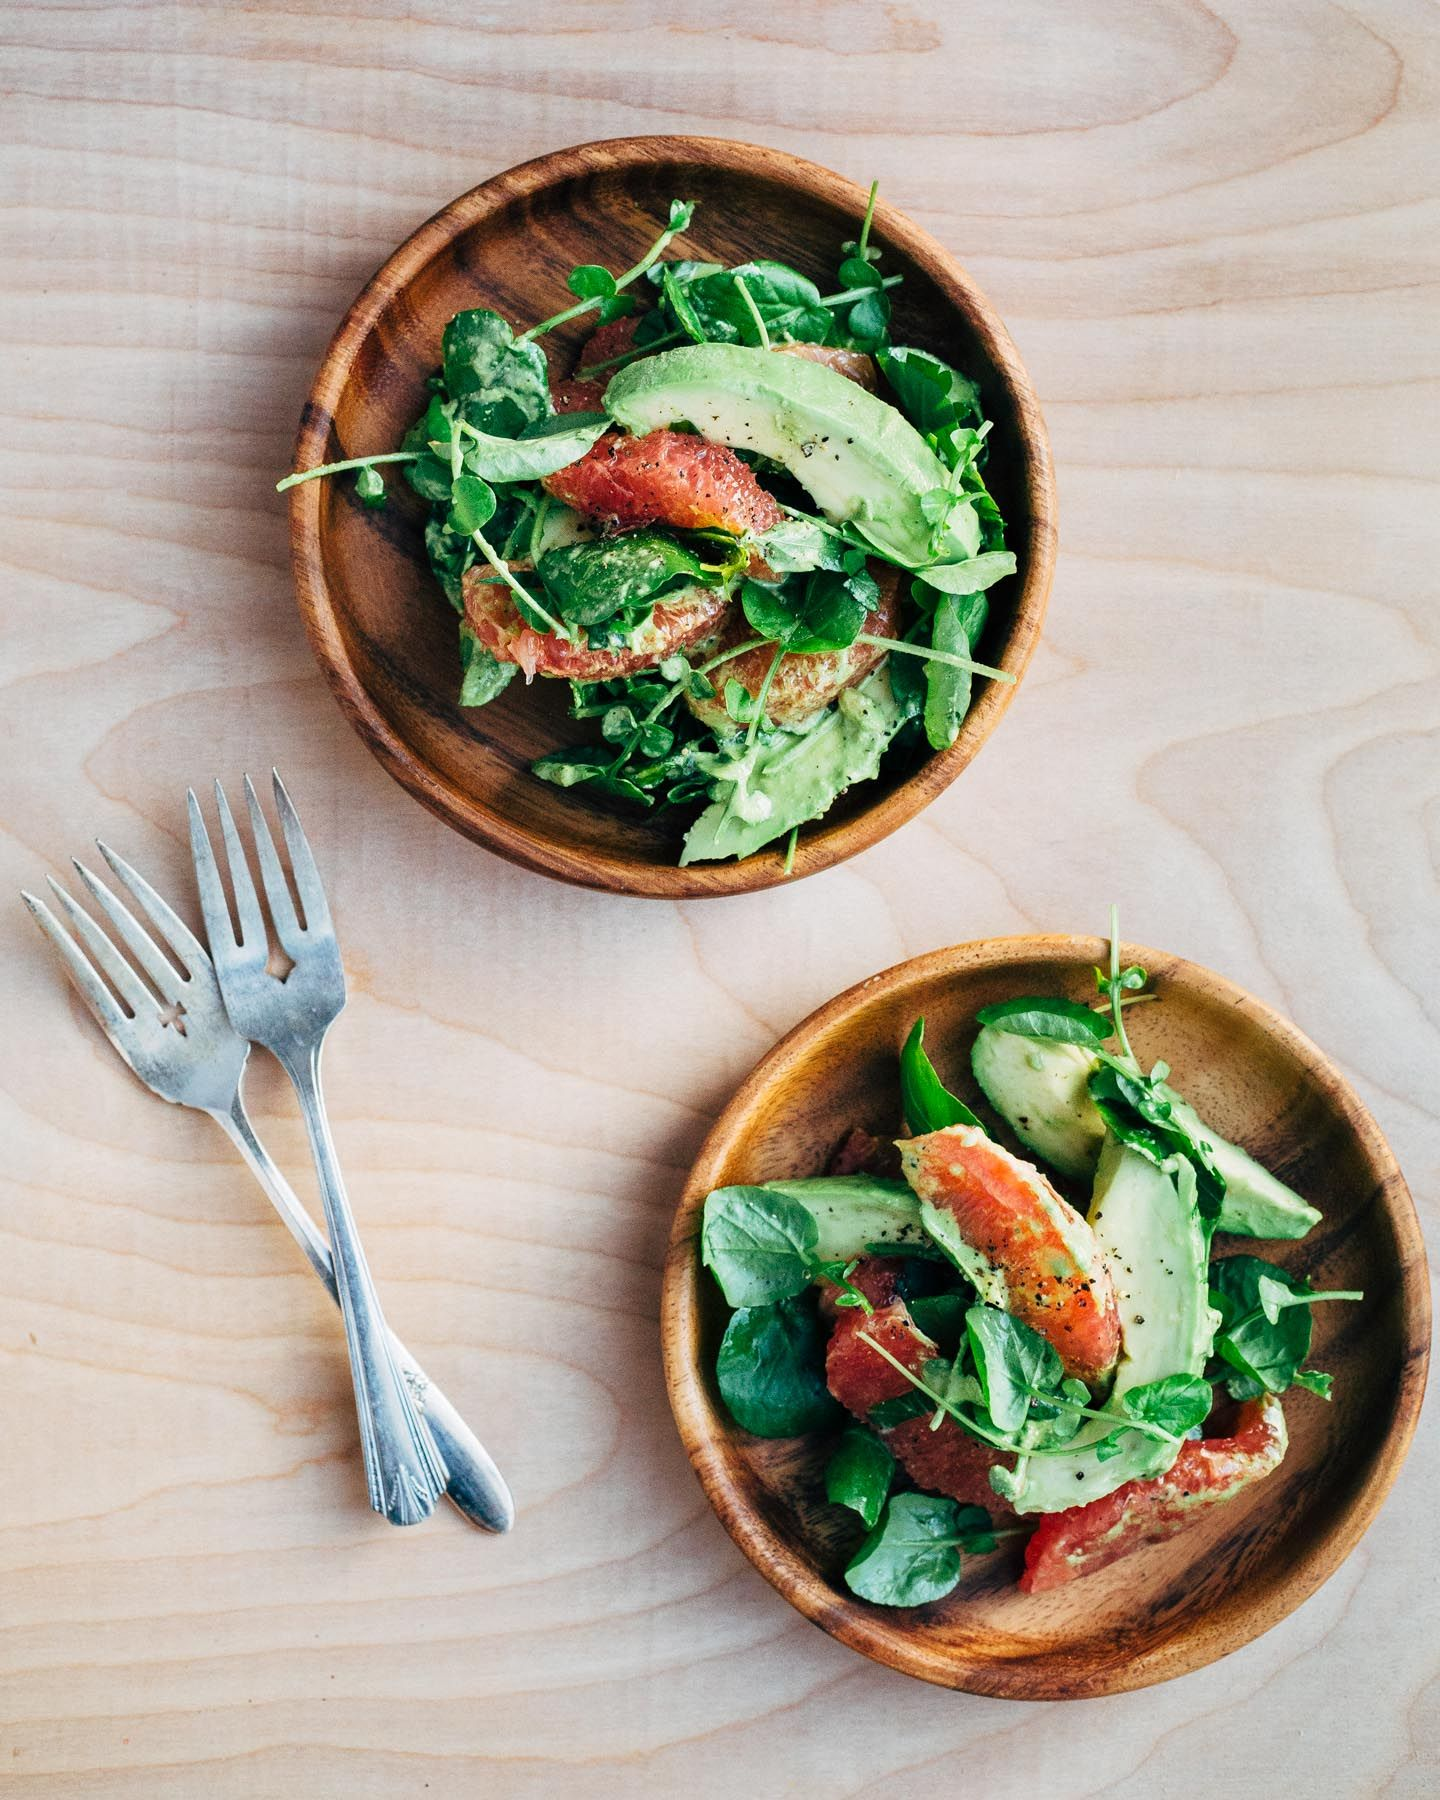 citrus-avocado salad with pepita green goddess dressing // brooklyn supper